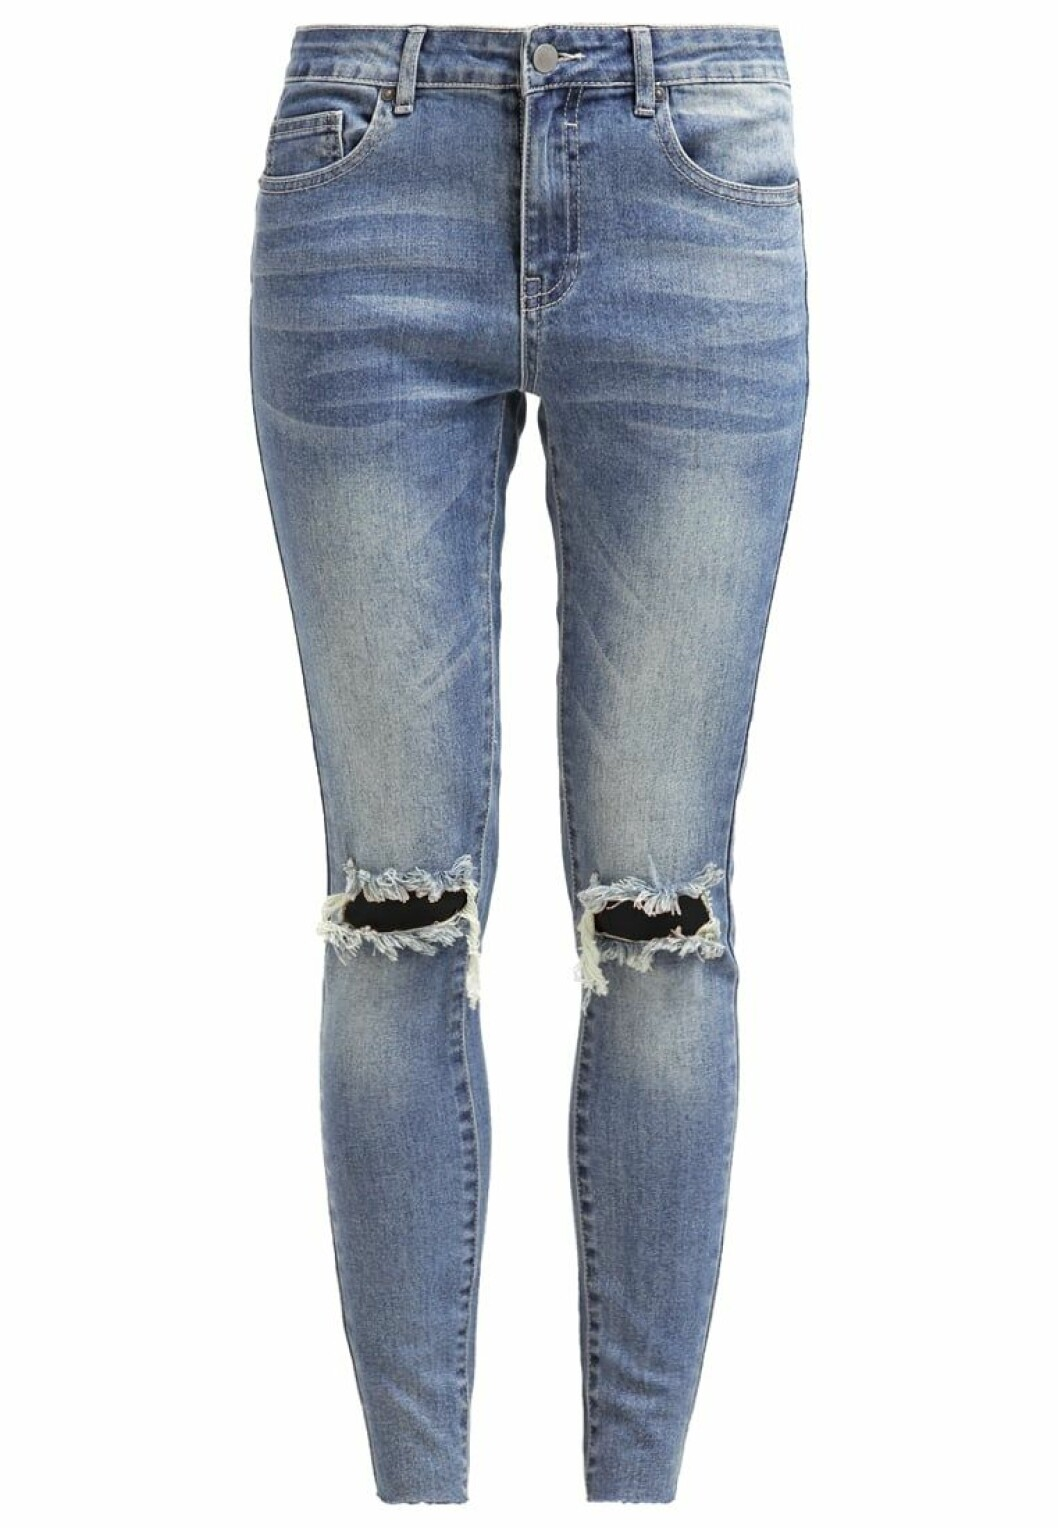 ljusa slitna jeans 2016